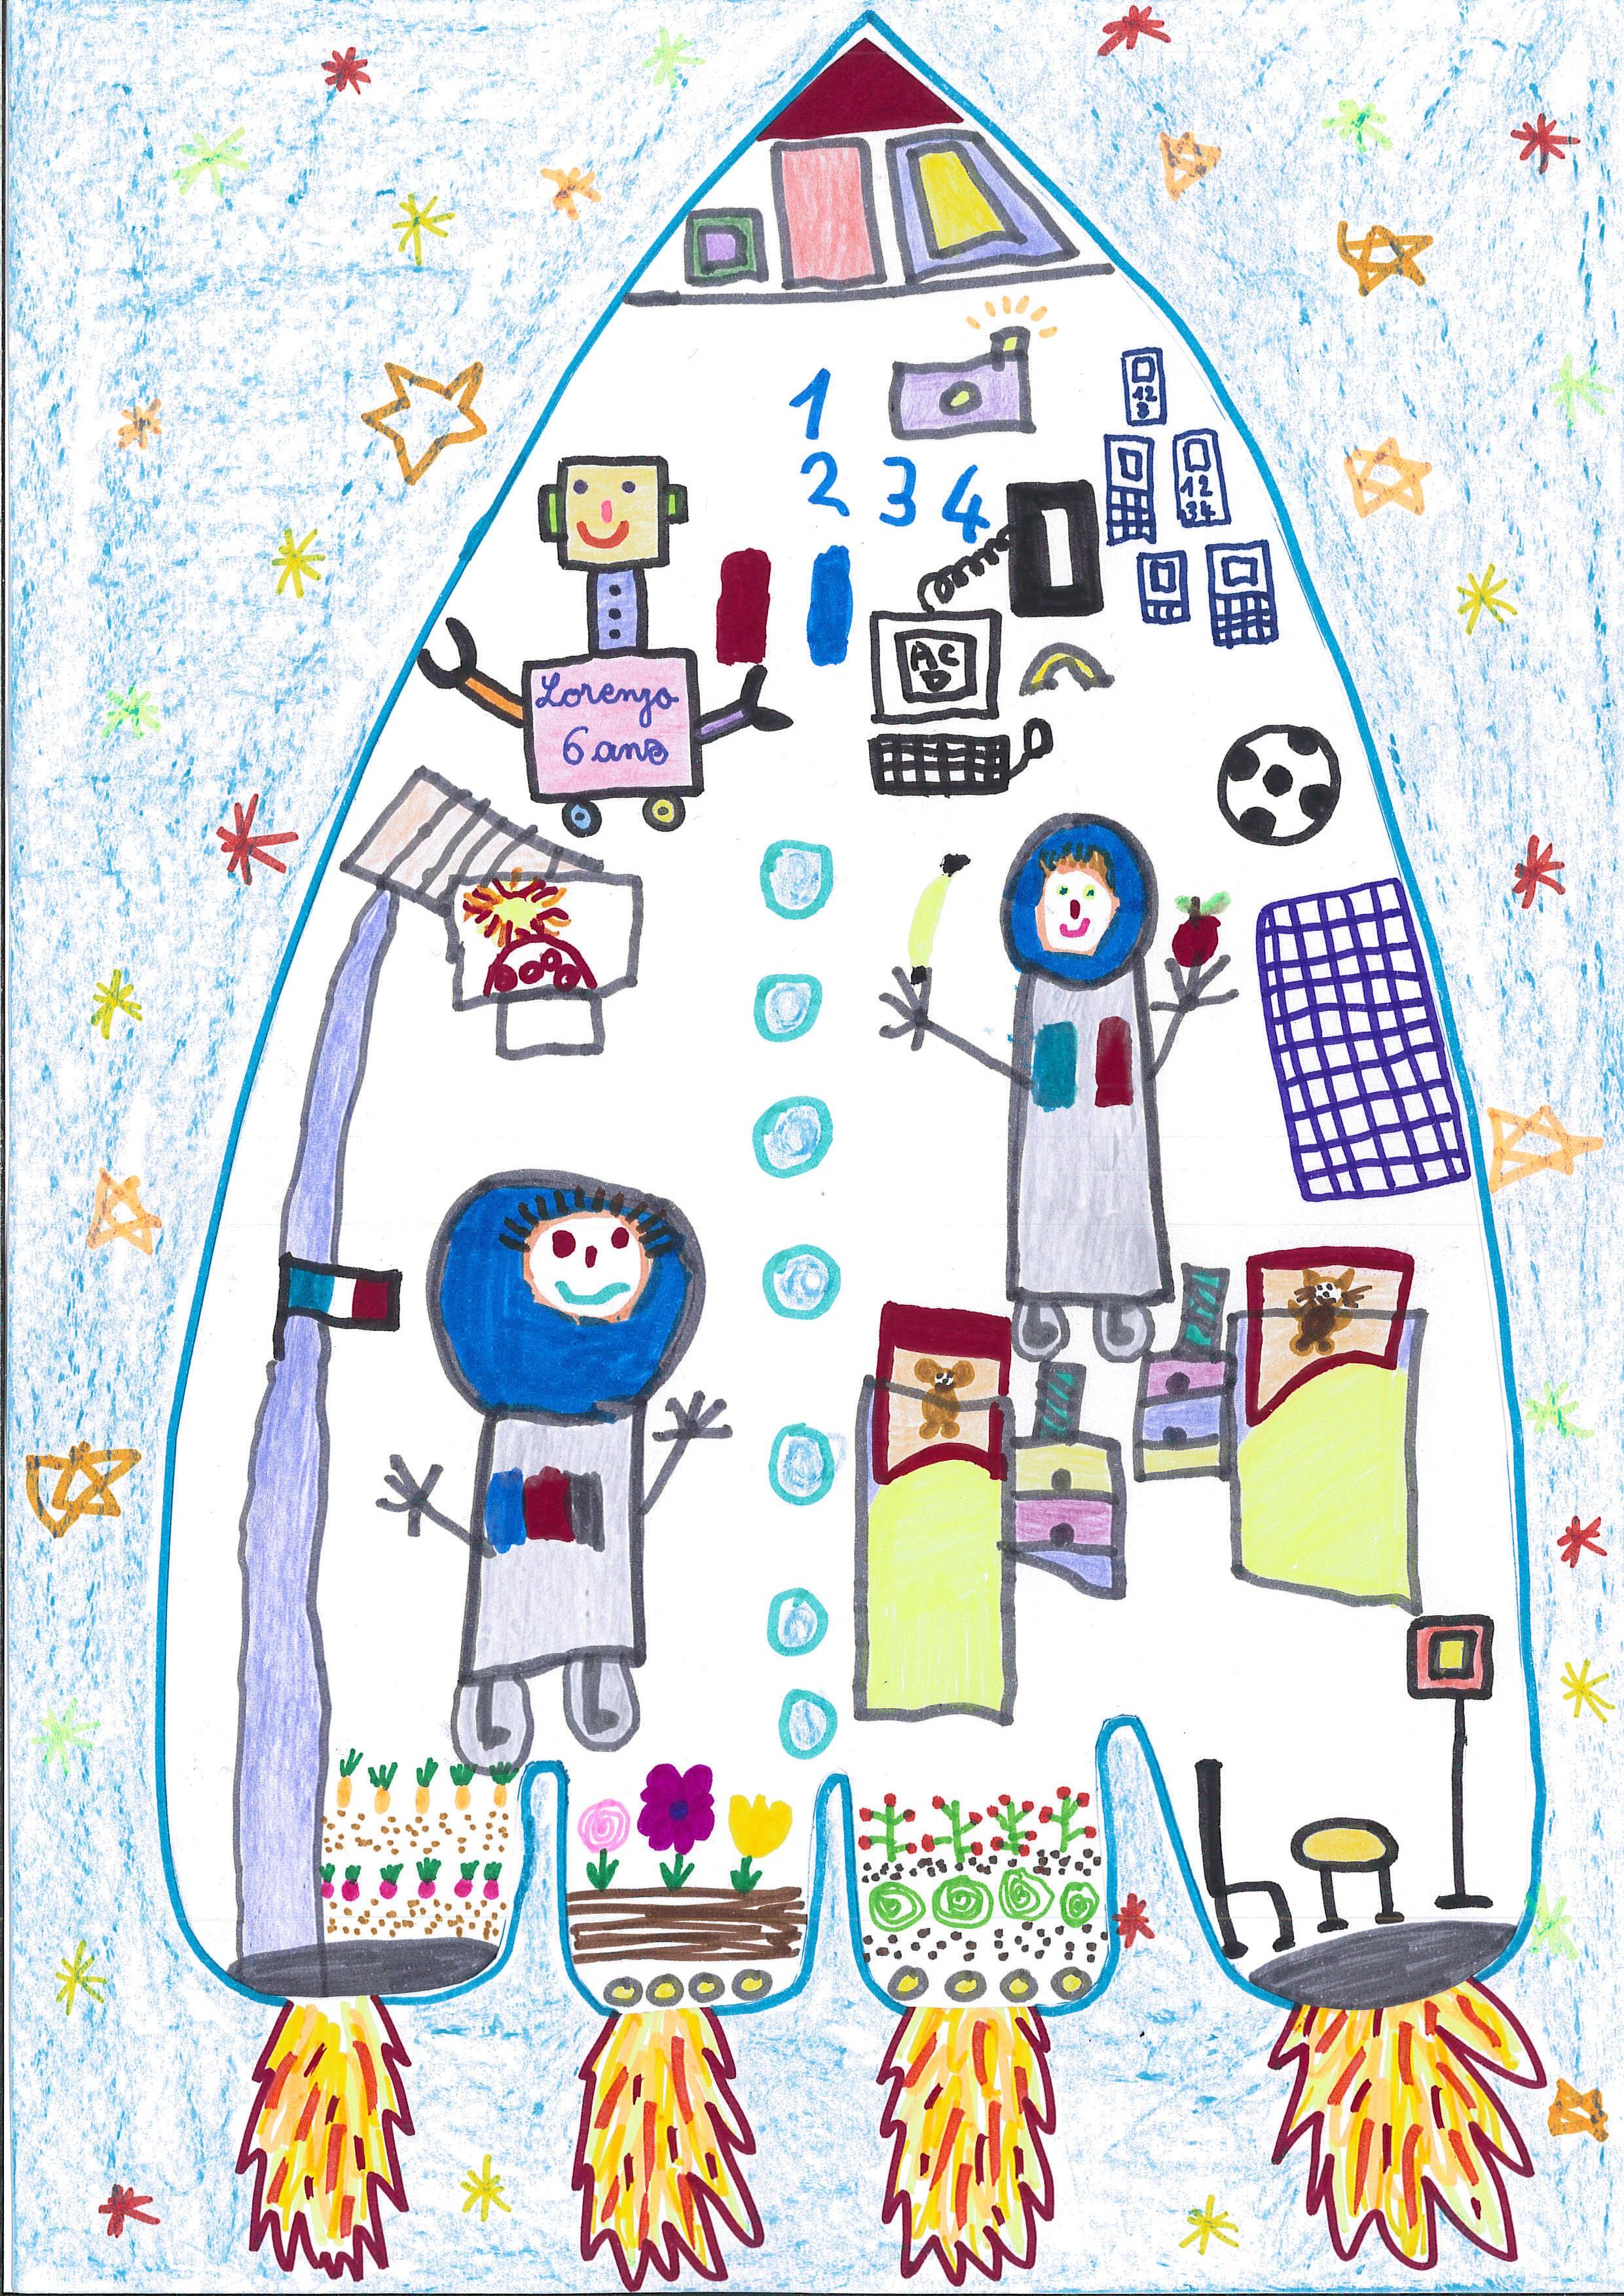 prx_imagine_ta_vie_dans_un_vaisseau_spatial_dessin_gagnant.jpg